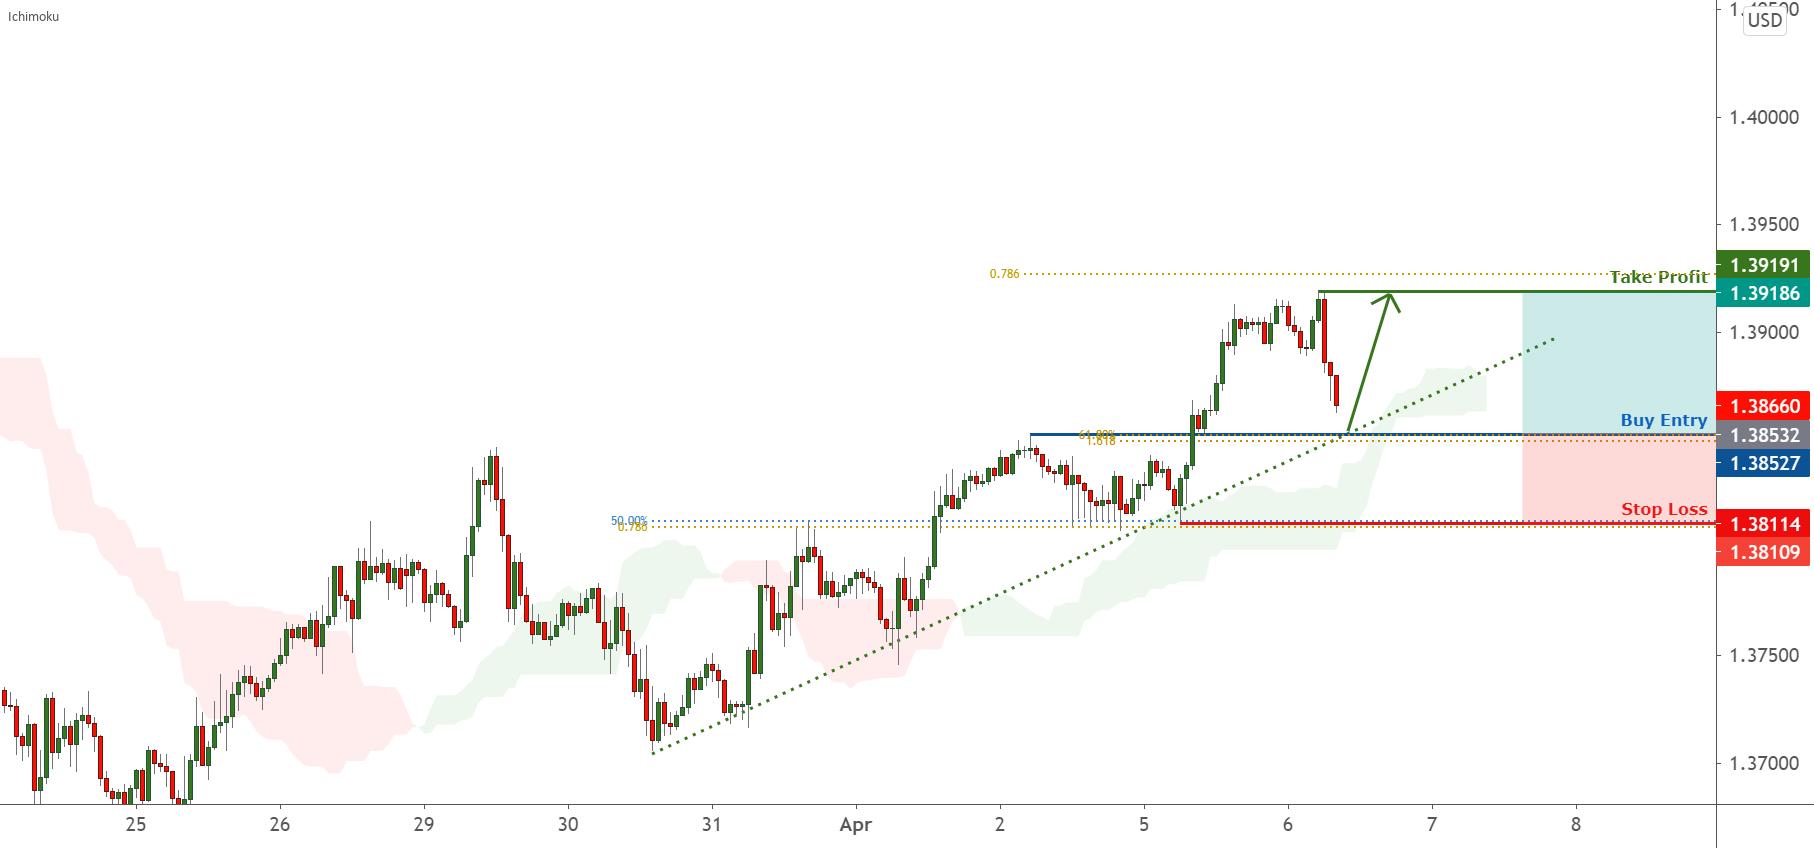 GBPUSD is facing bullish pressure | 06 Apr 2021 for FX:GBPUSD by FXCM